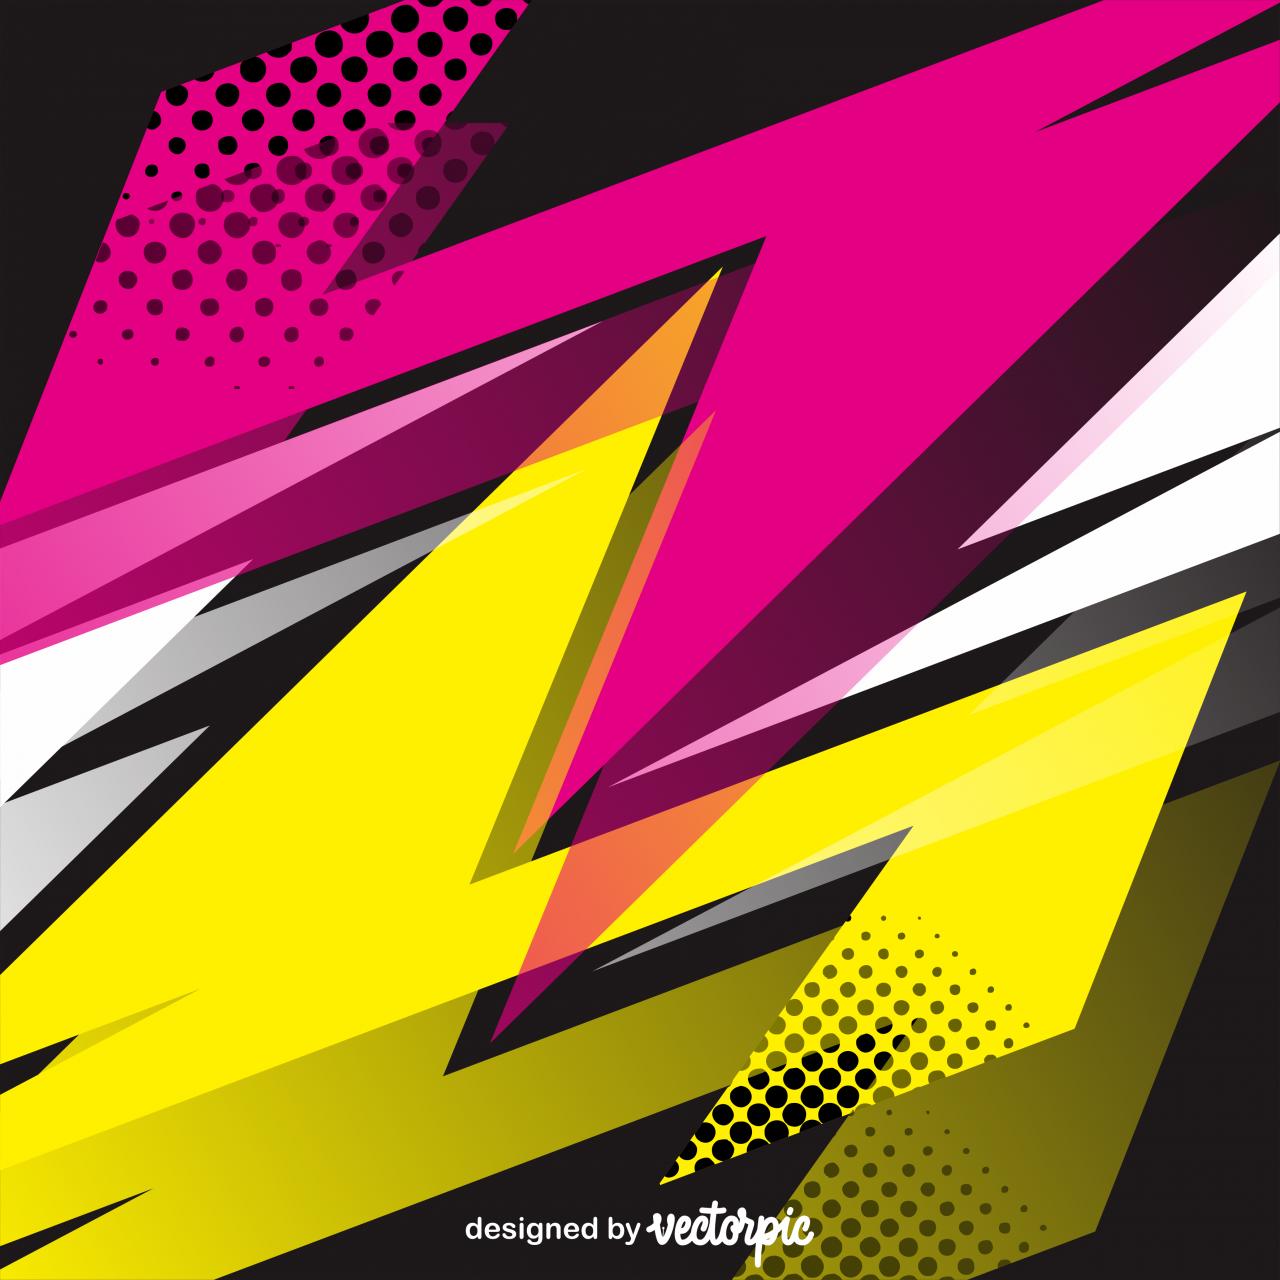 Racing Stripes Streaks Background Free Vector Ilustrasi Grafis Seni Geometris Desain Latar Belakang